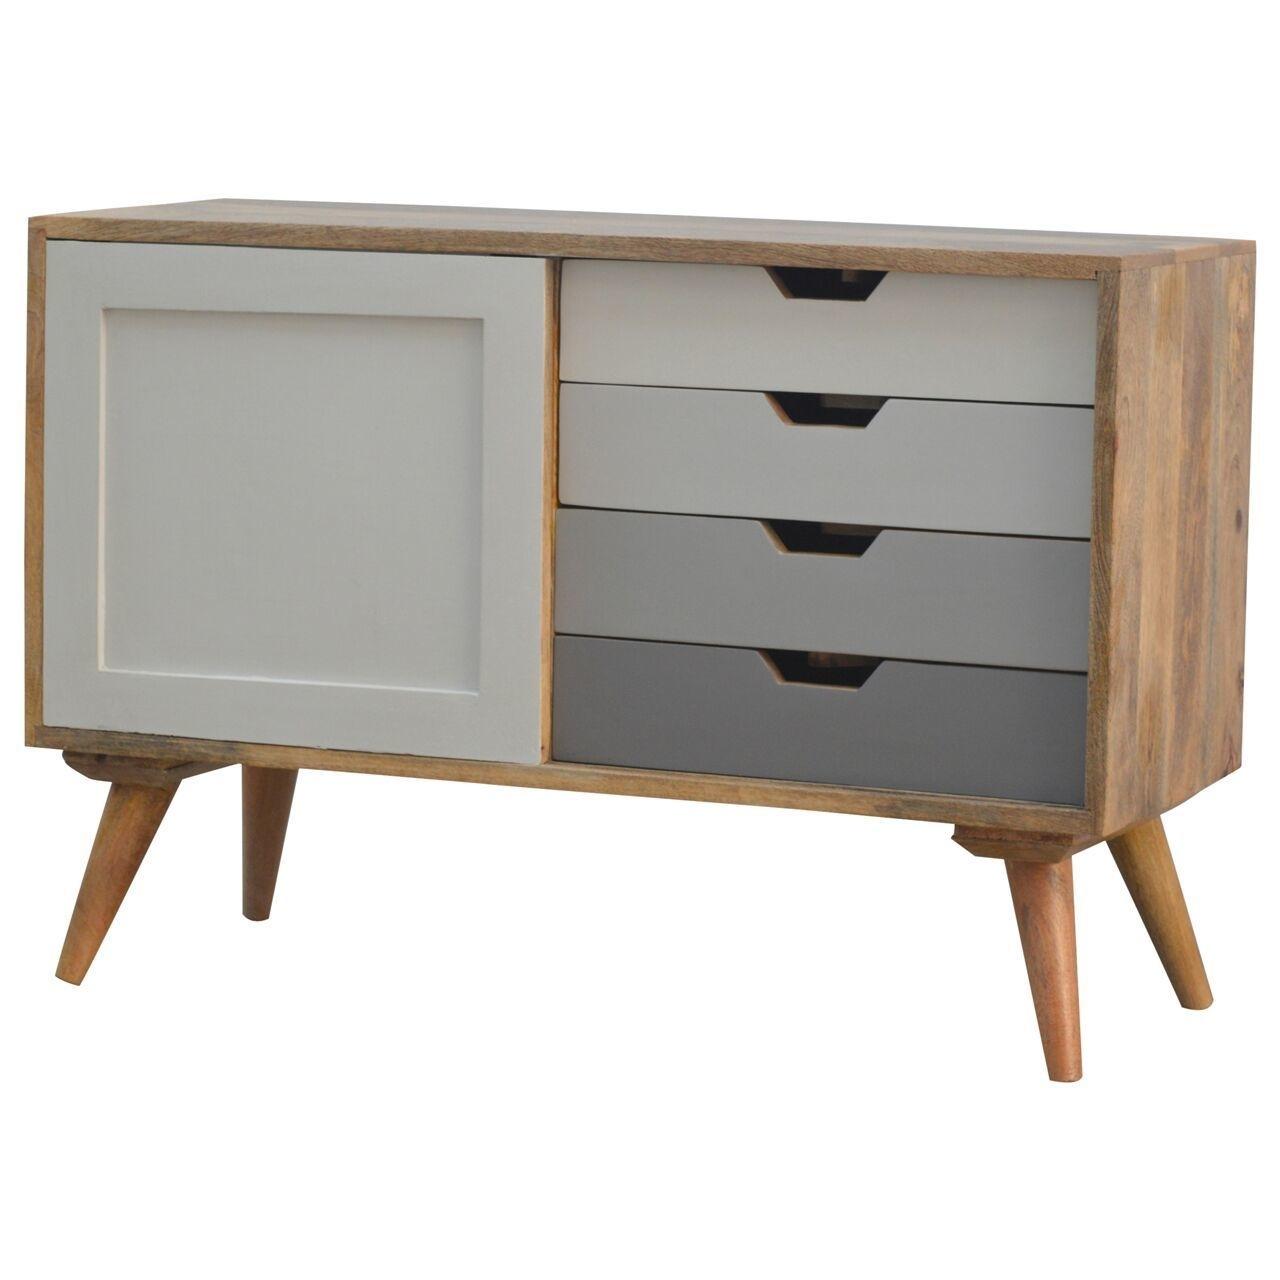 4 Drawer Mango Wood Cabinet With Sliding Door | Vinterior throughout Mango Wood Grey 4-Drawer 4-Door Sideboards (Image 2 of 30)